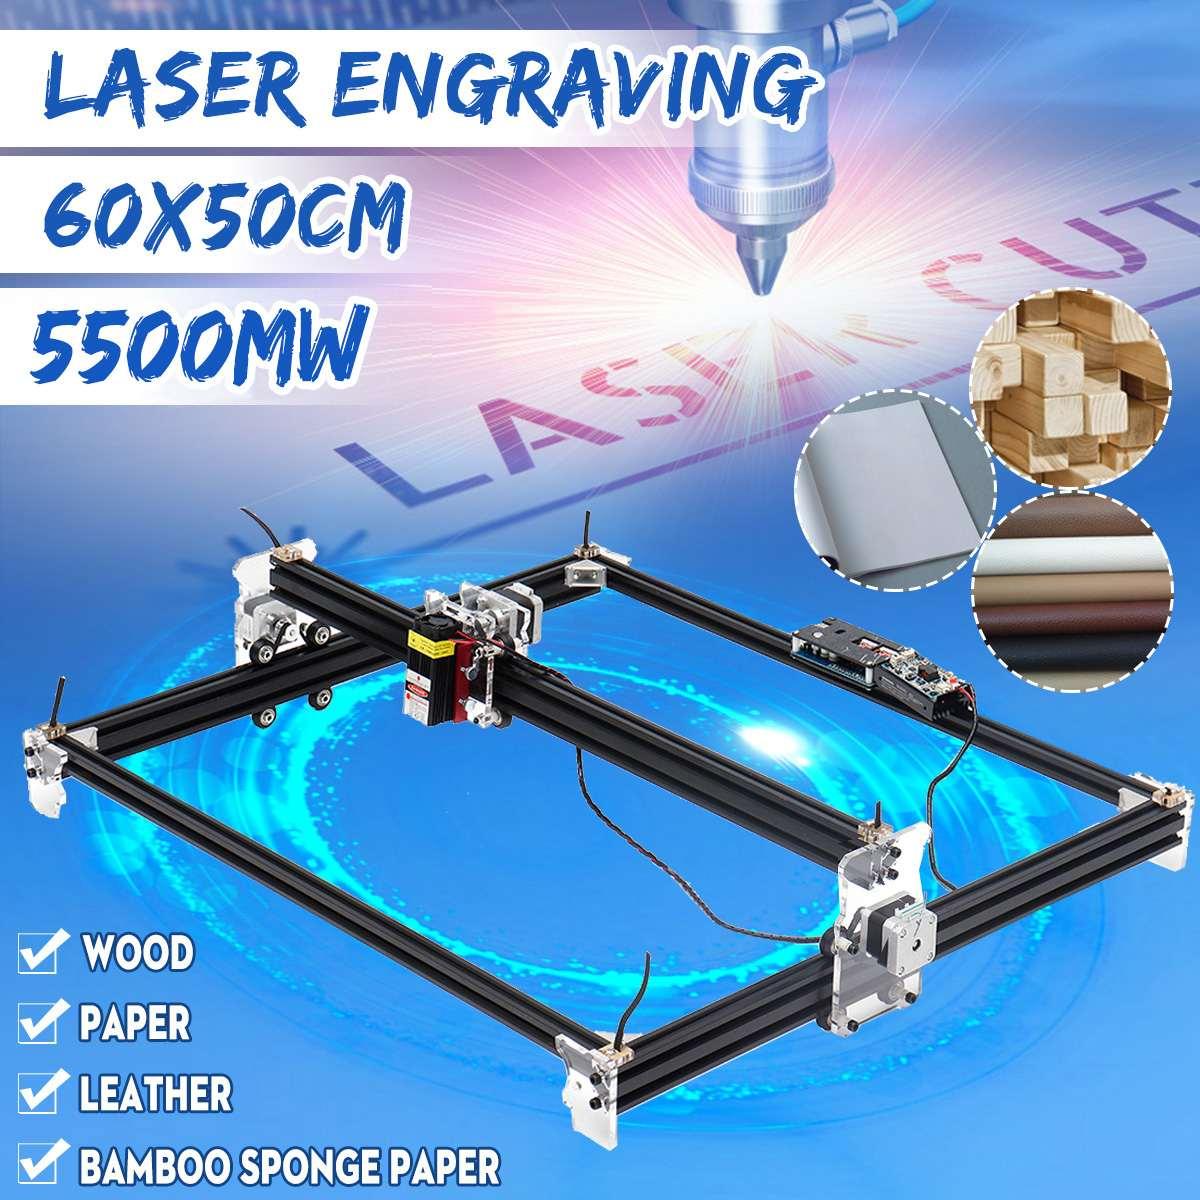 110-220V 5500MW 2-Axis Mini USB DIY Desktop Laser Engraver Engraving Machine Carver Kit 650*500mm Wood Router/Cutter/Printer